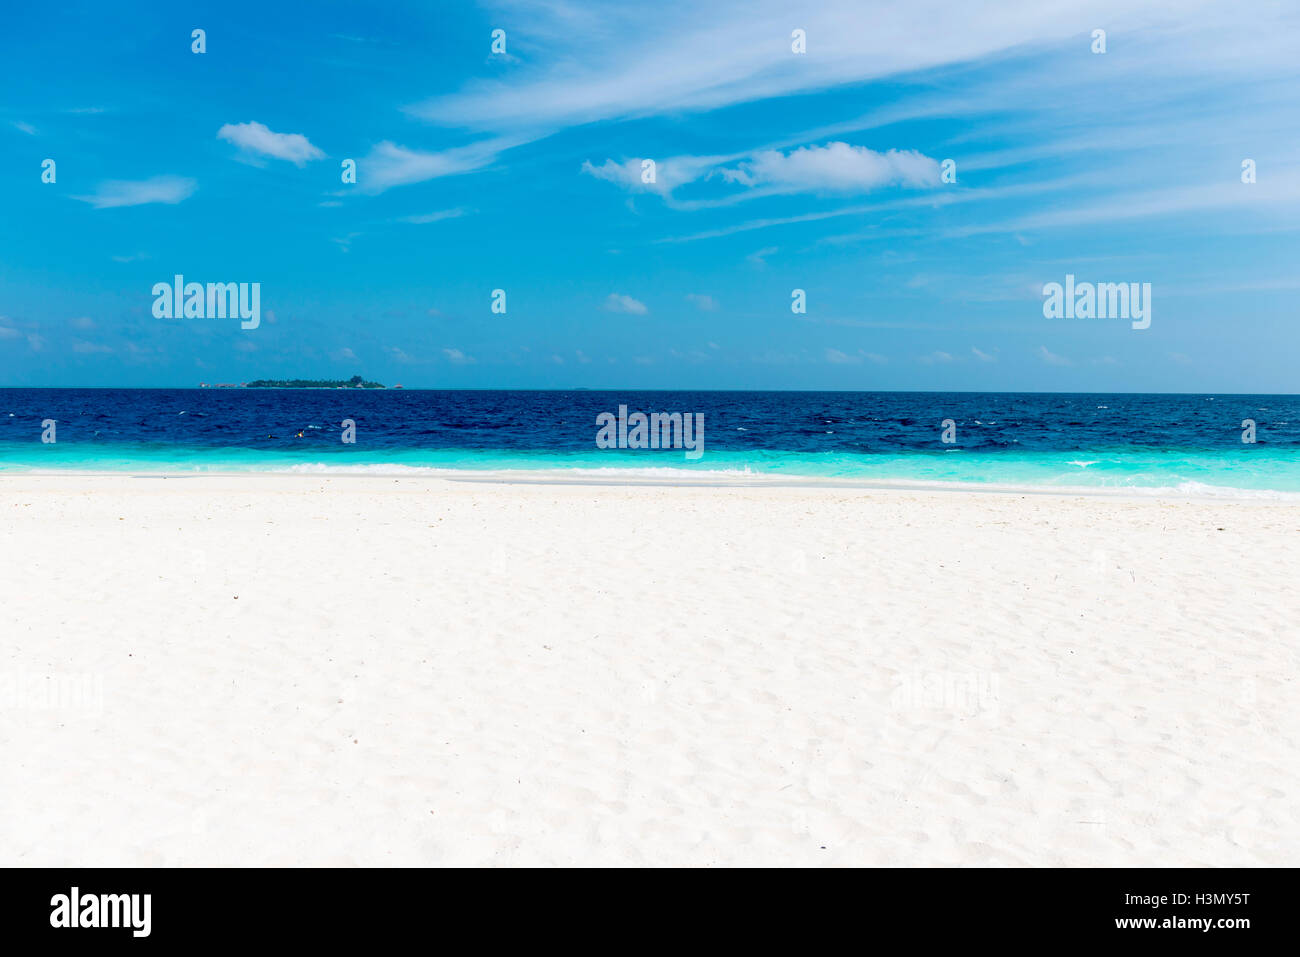 Playa de arena blanca, Maldivas Foto de stock